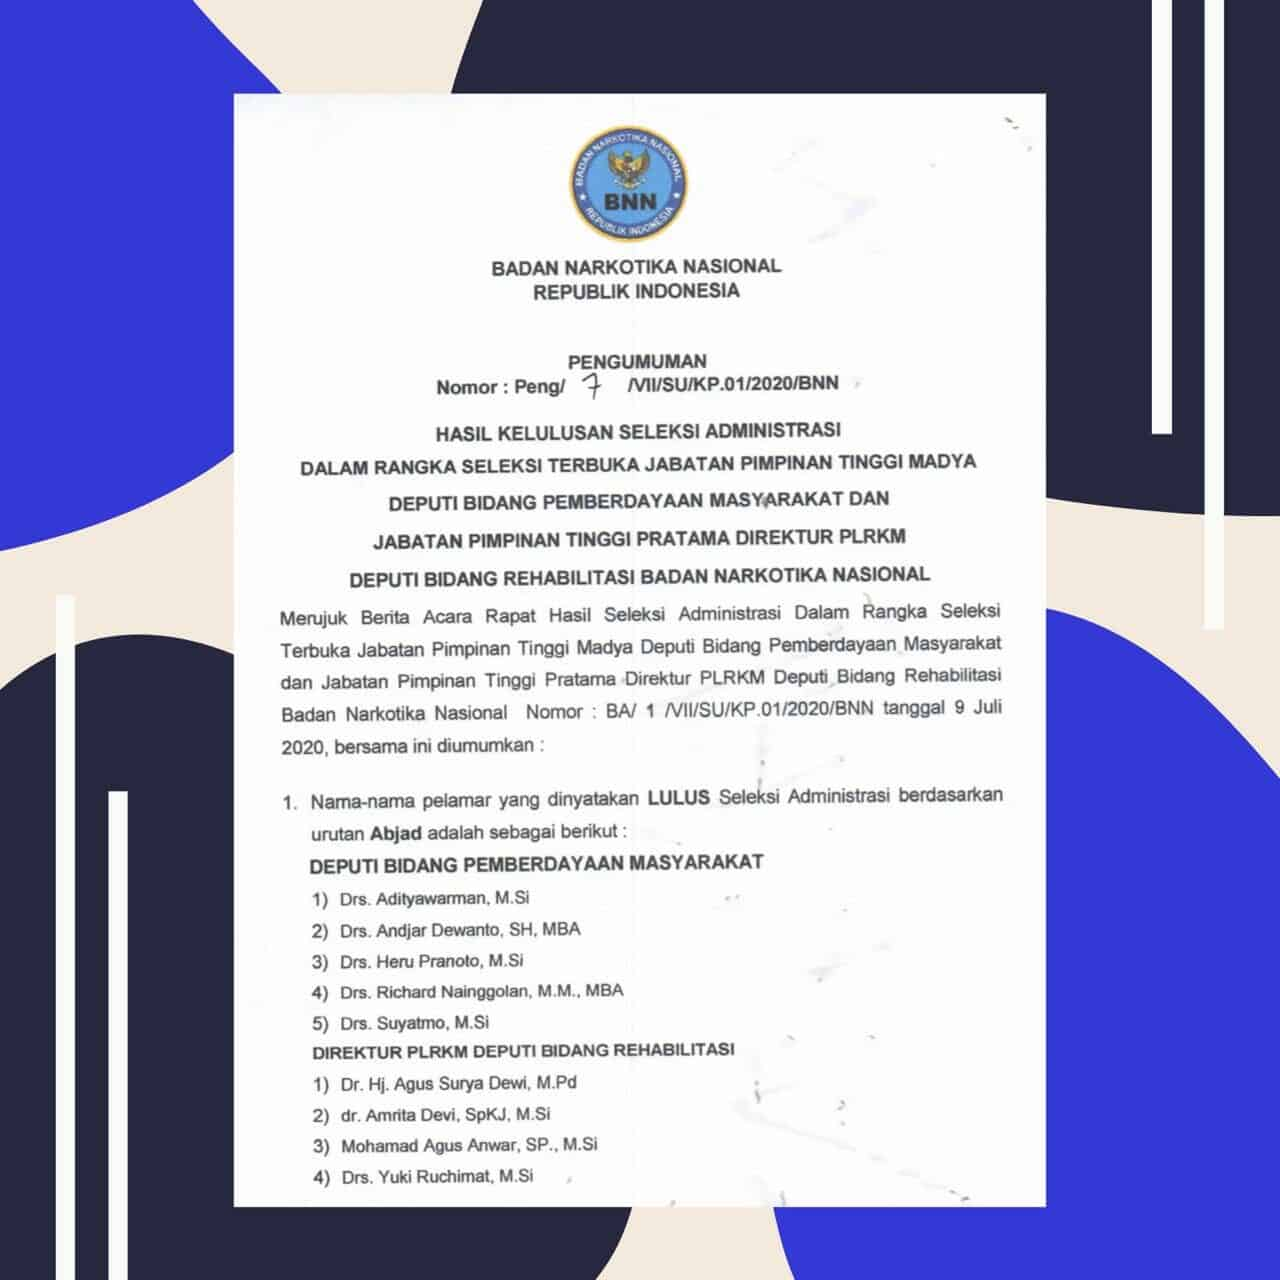 Pengumuman Hasil Seleksi Administrasi Jabatan Pimpinan Tinggi Madya Deputi Bidang Pemberdayaan Masyarakat dan Direktur PLRKM Deputi Bidan Rehabilitasi BNN